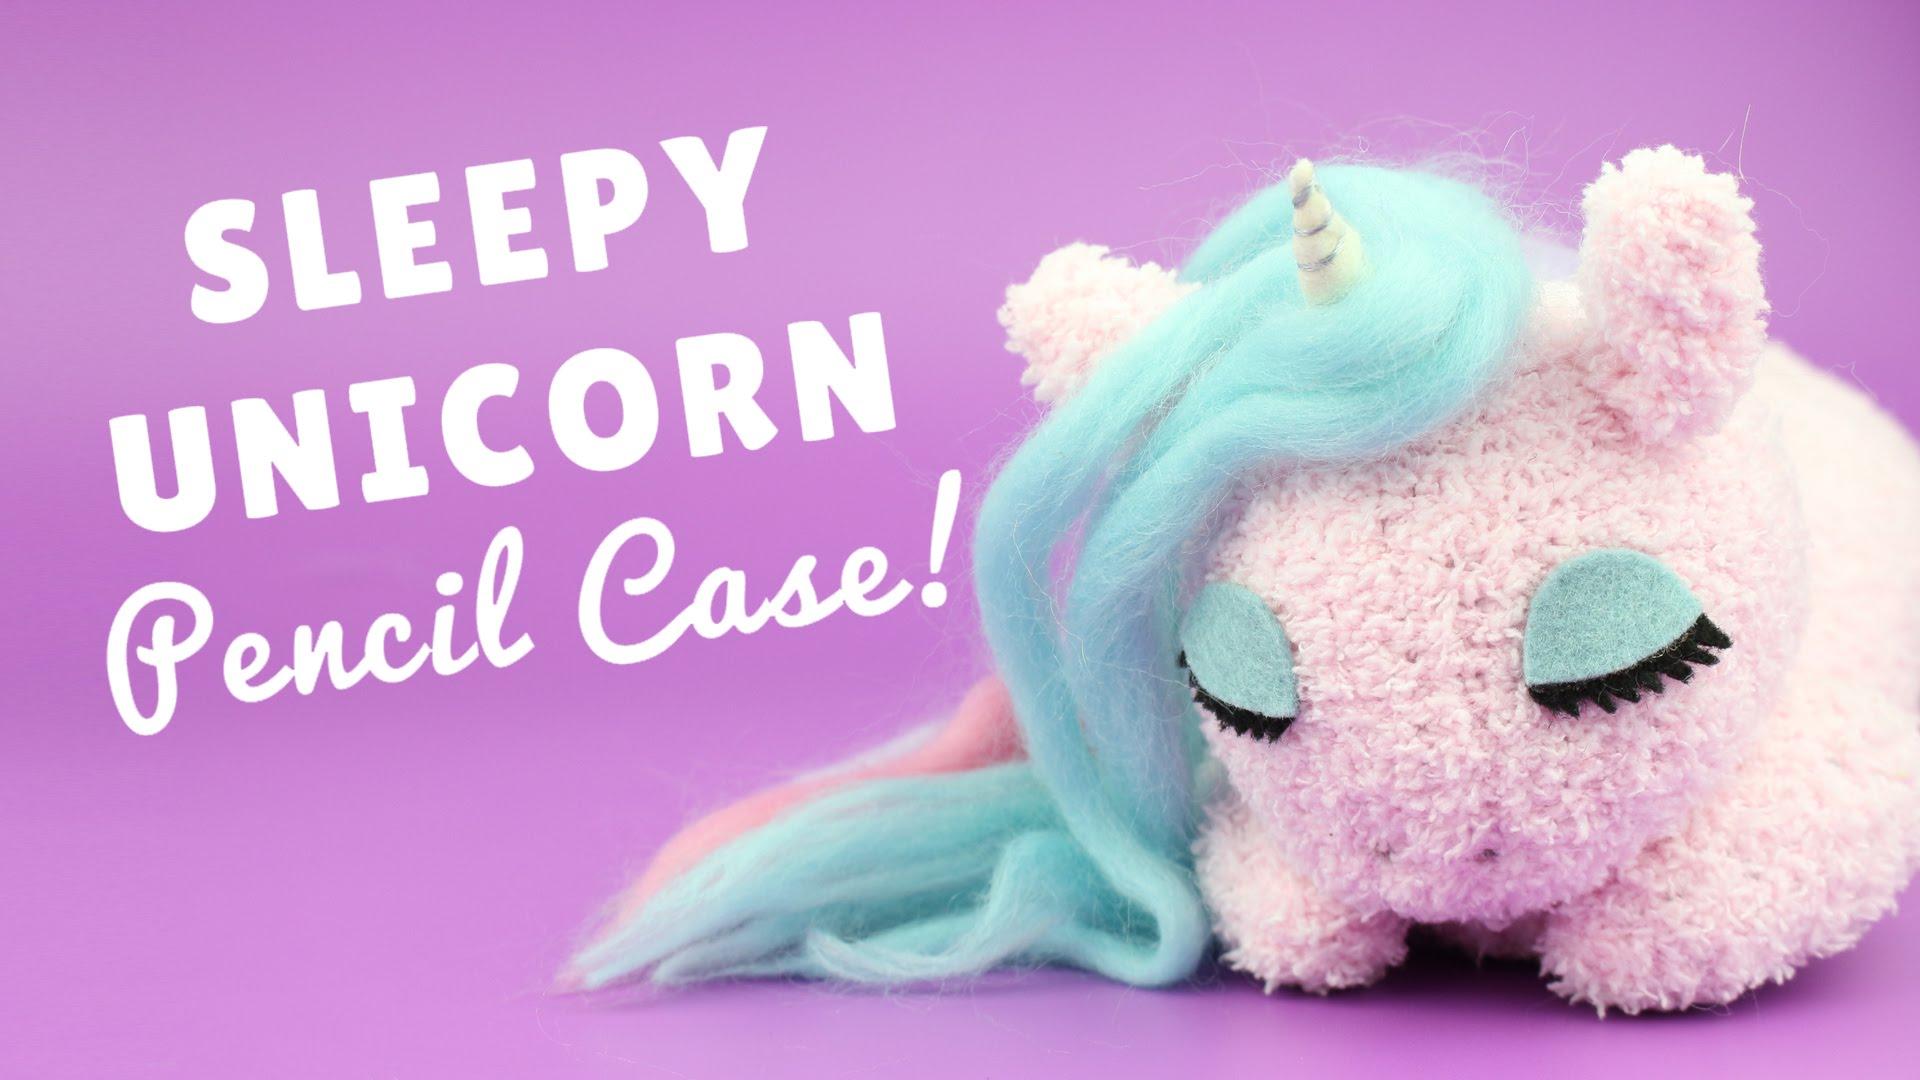 Awesome Unicorn Diy Projects Tiny Treasures I Love Unicorns Sleepy Pencil Case